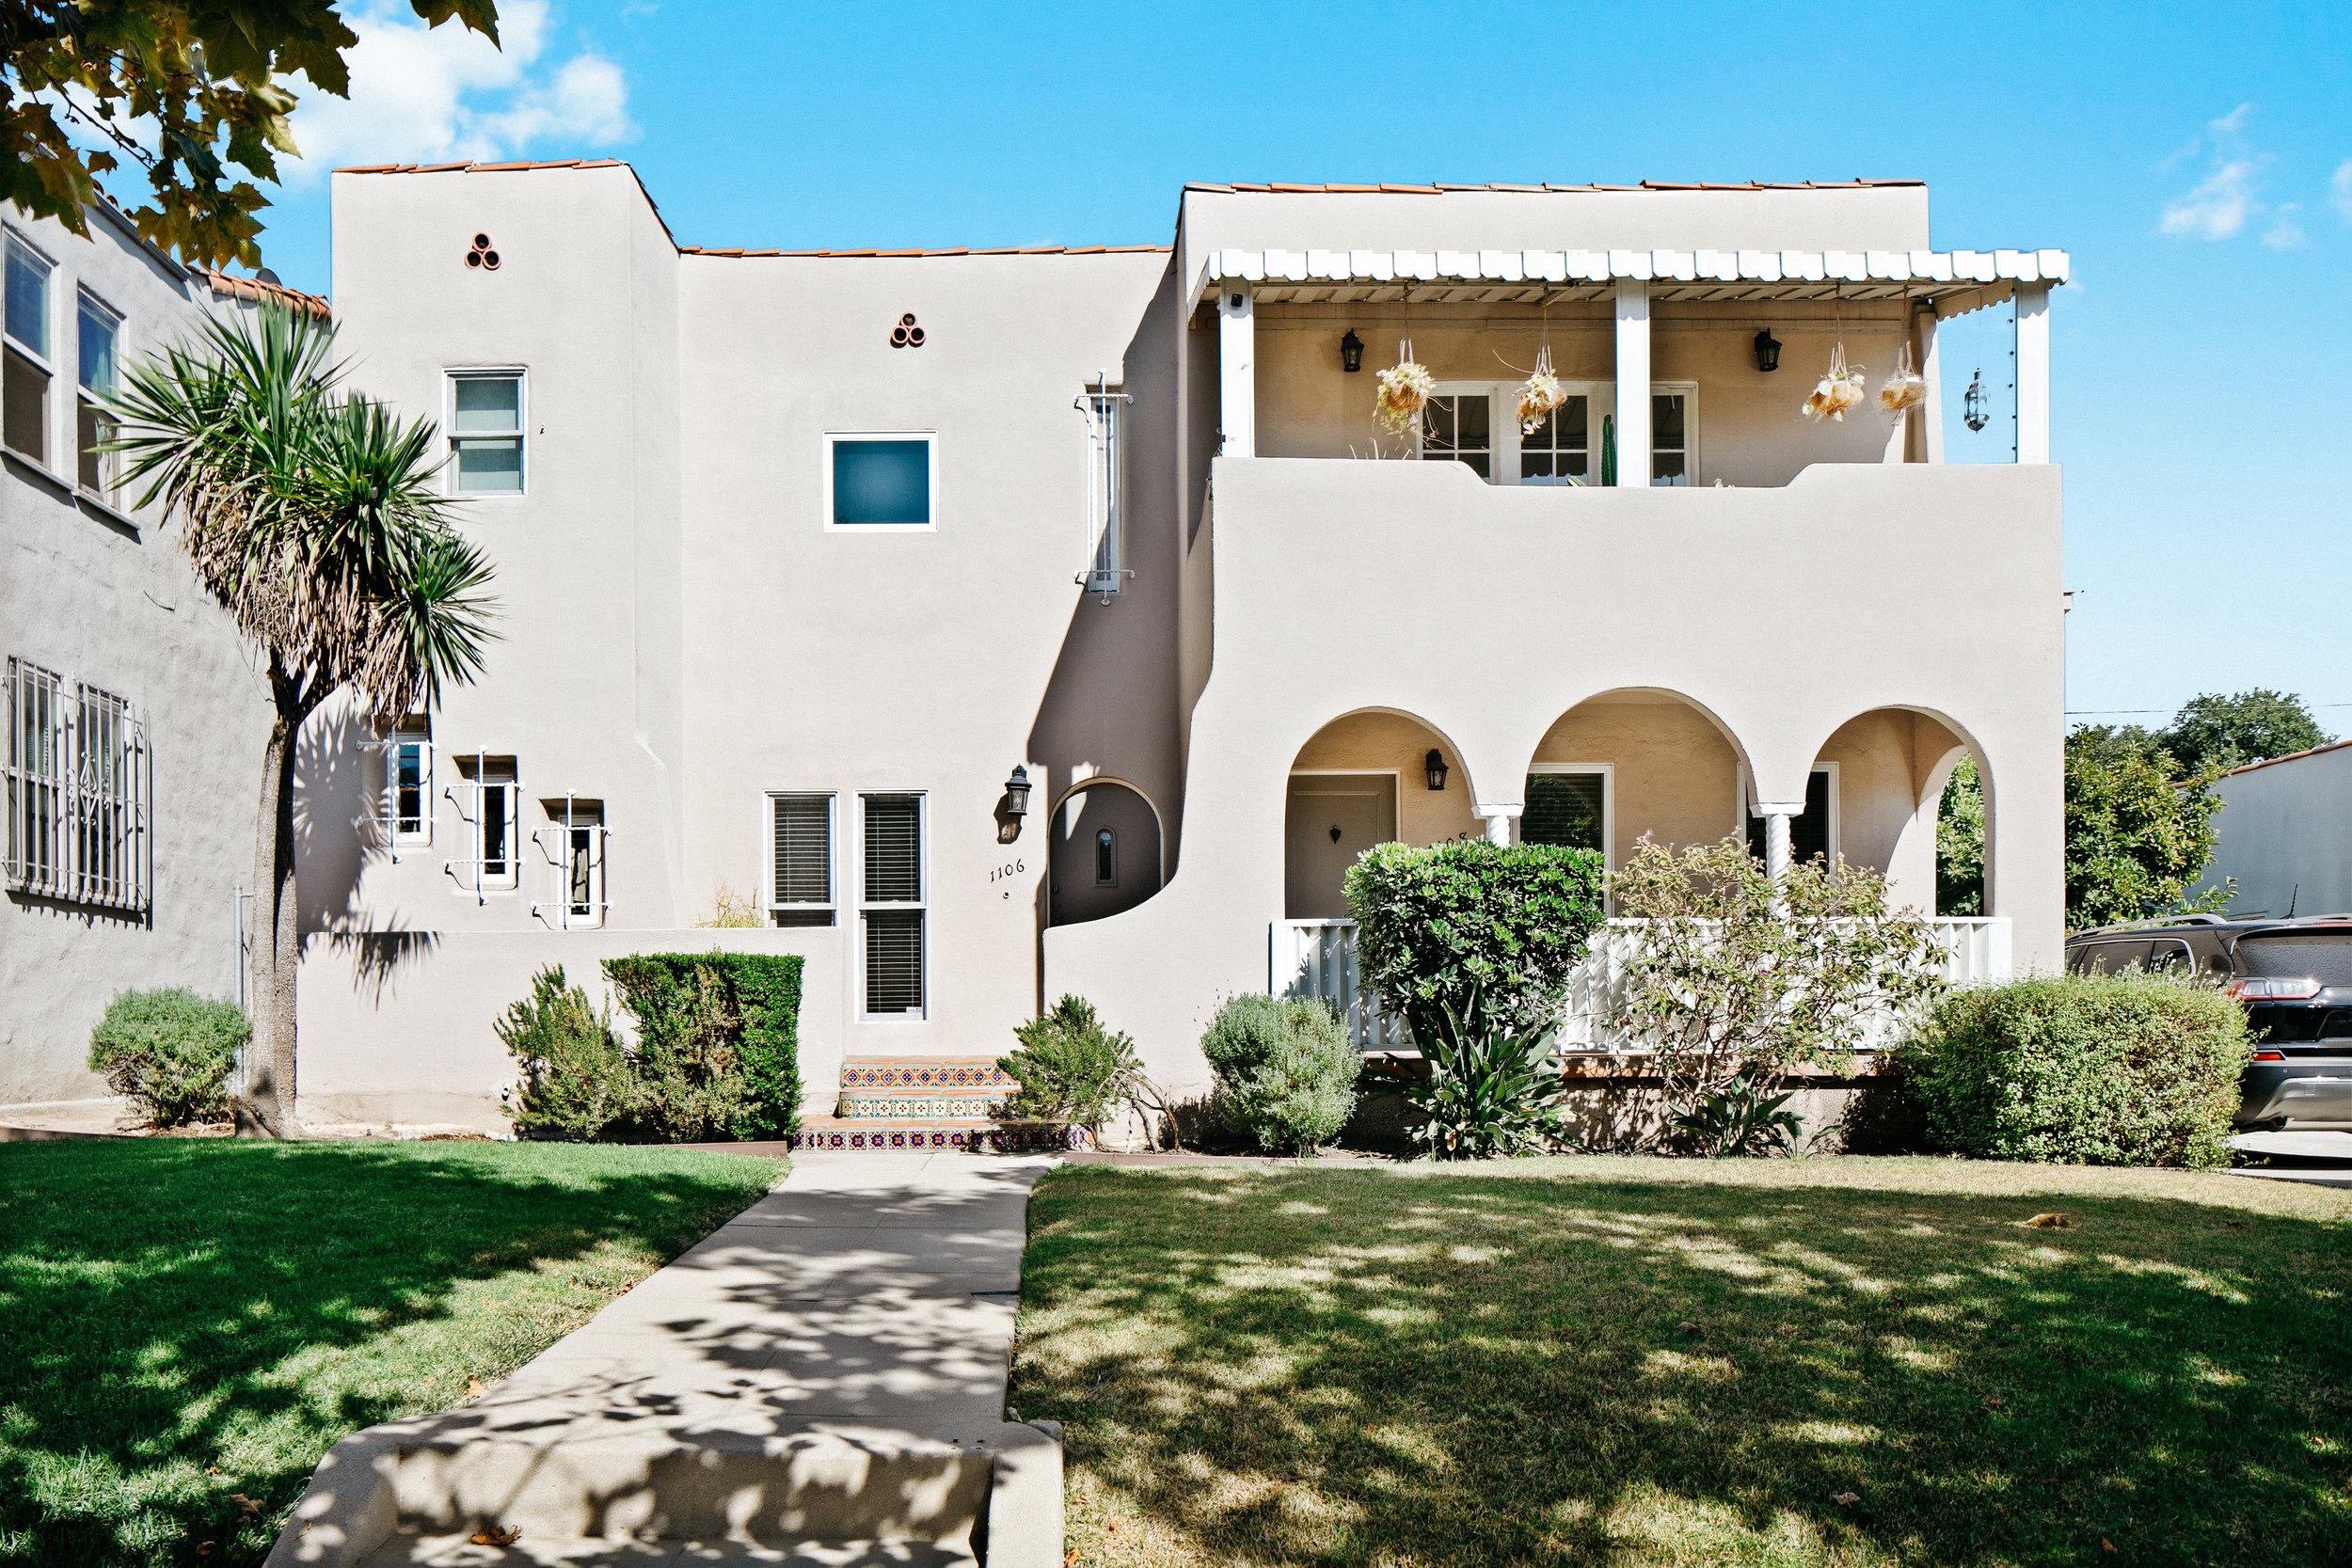 1106-1108 Carmona Ave.  $1,395,000 | JUST LISTED |  CarmonaDuplex.com